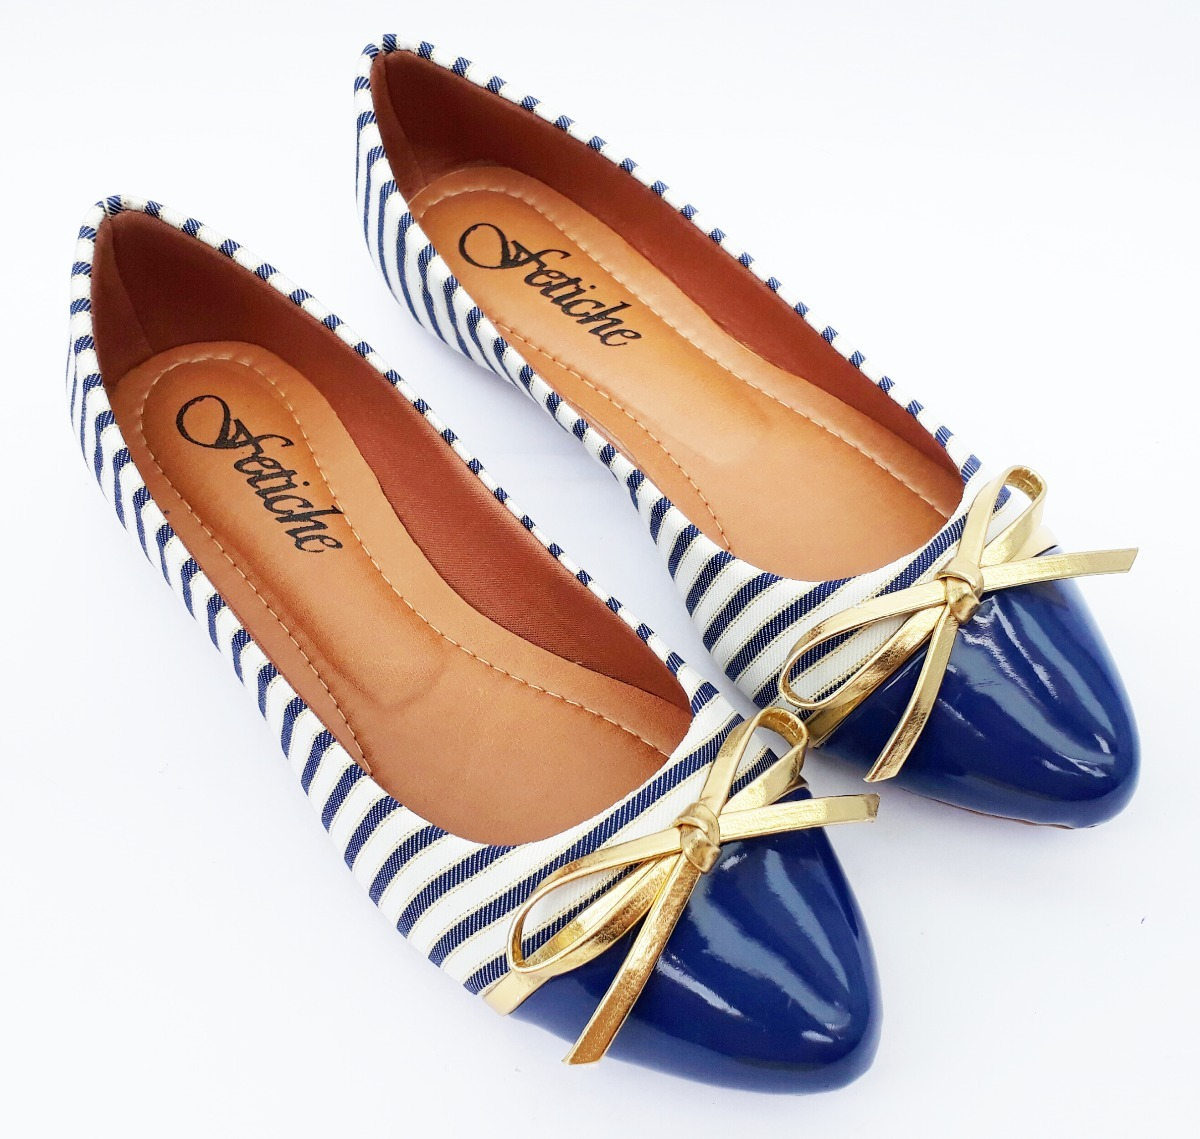 f90ab7b663 sapatilha feminina bico fino verniz laço rasteira sandalia. Carregando zoom.